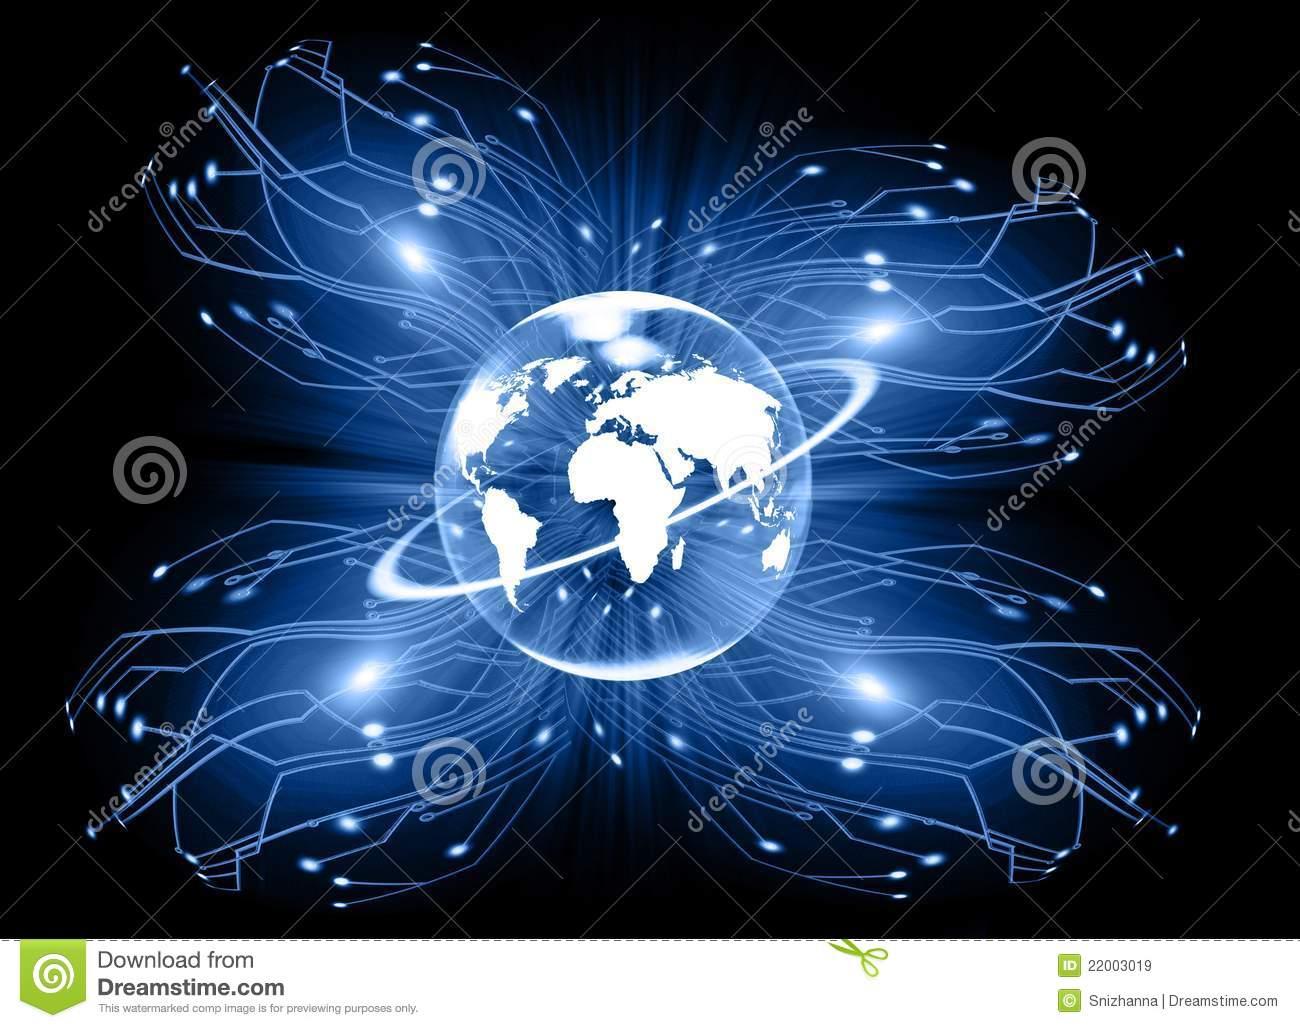 ECE 311 - Fundamentals of Electronic Communications